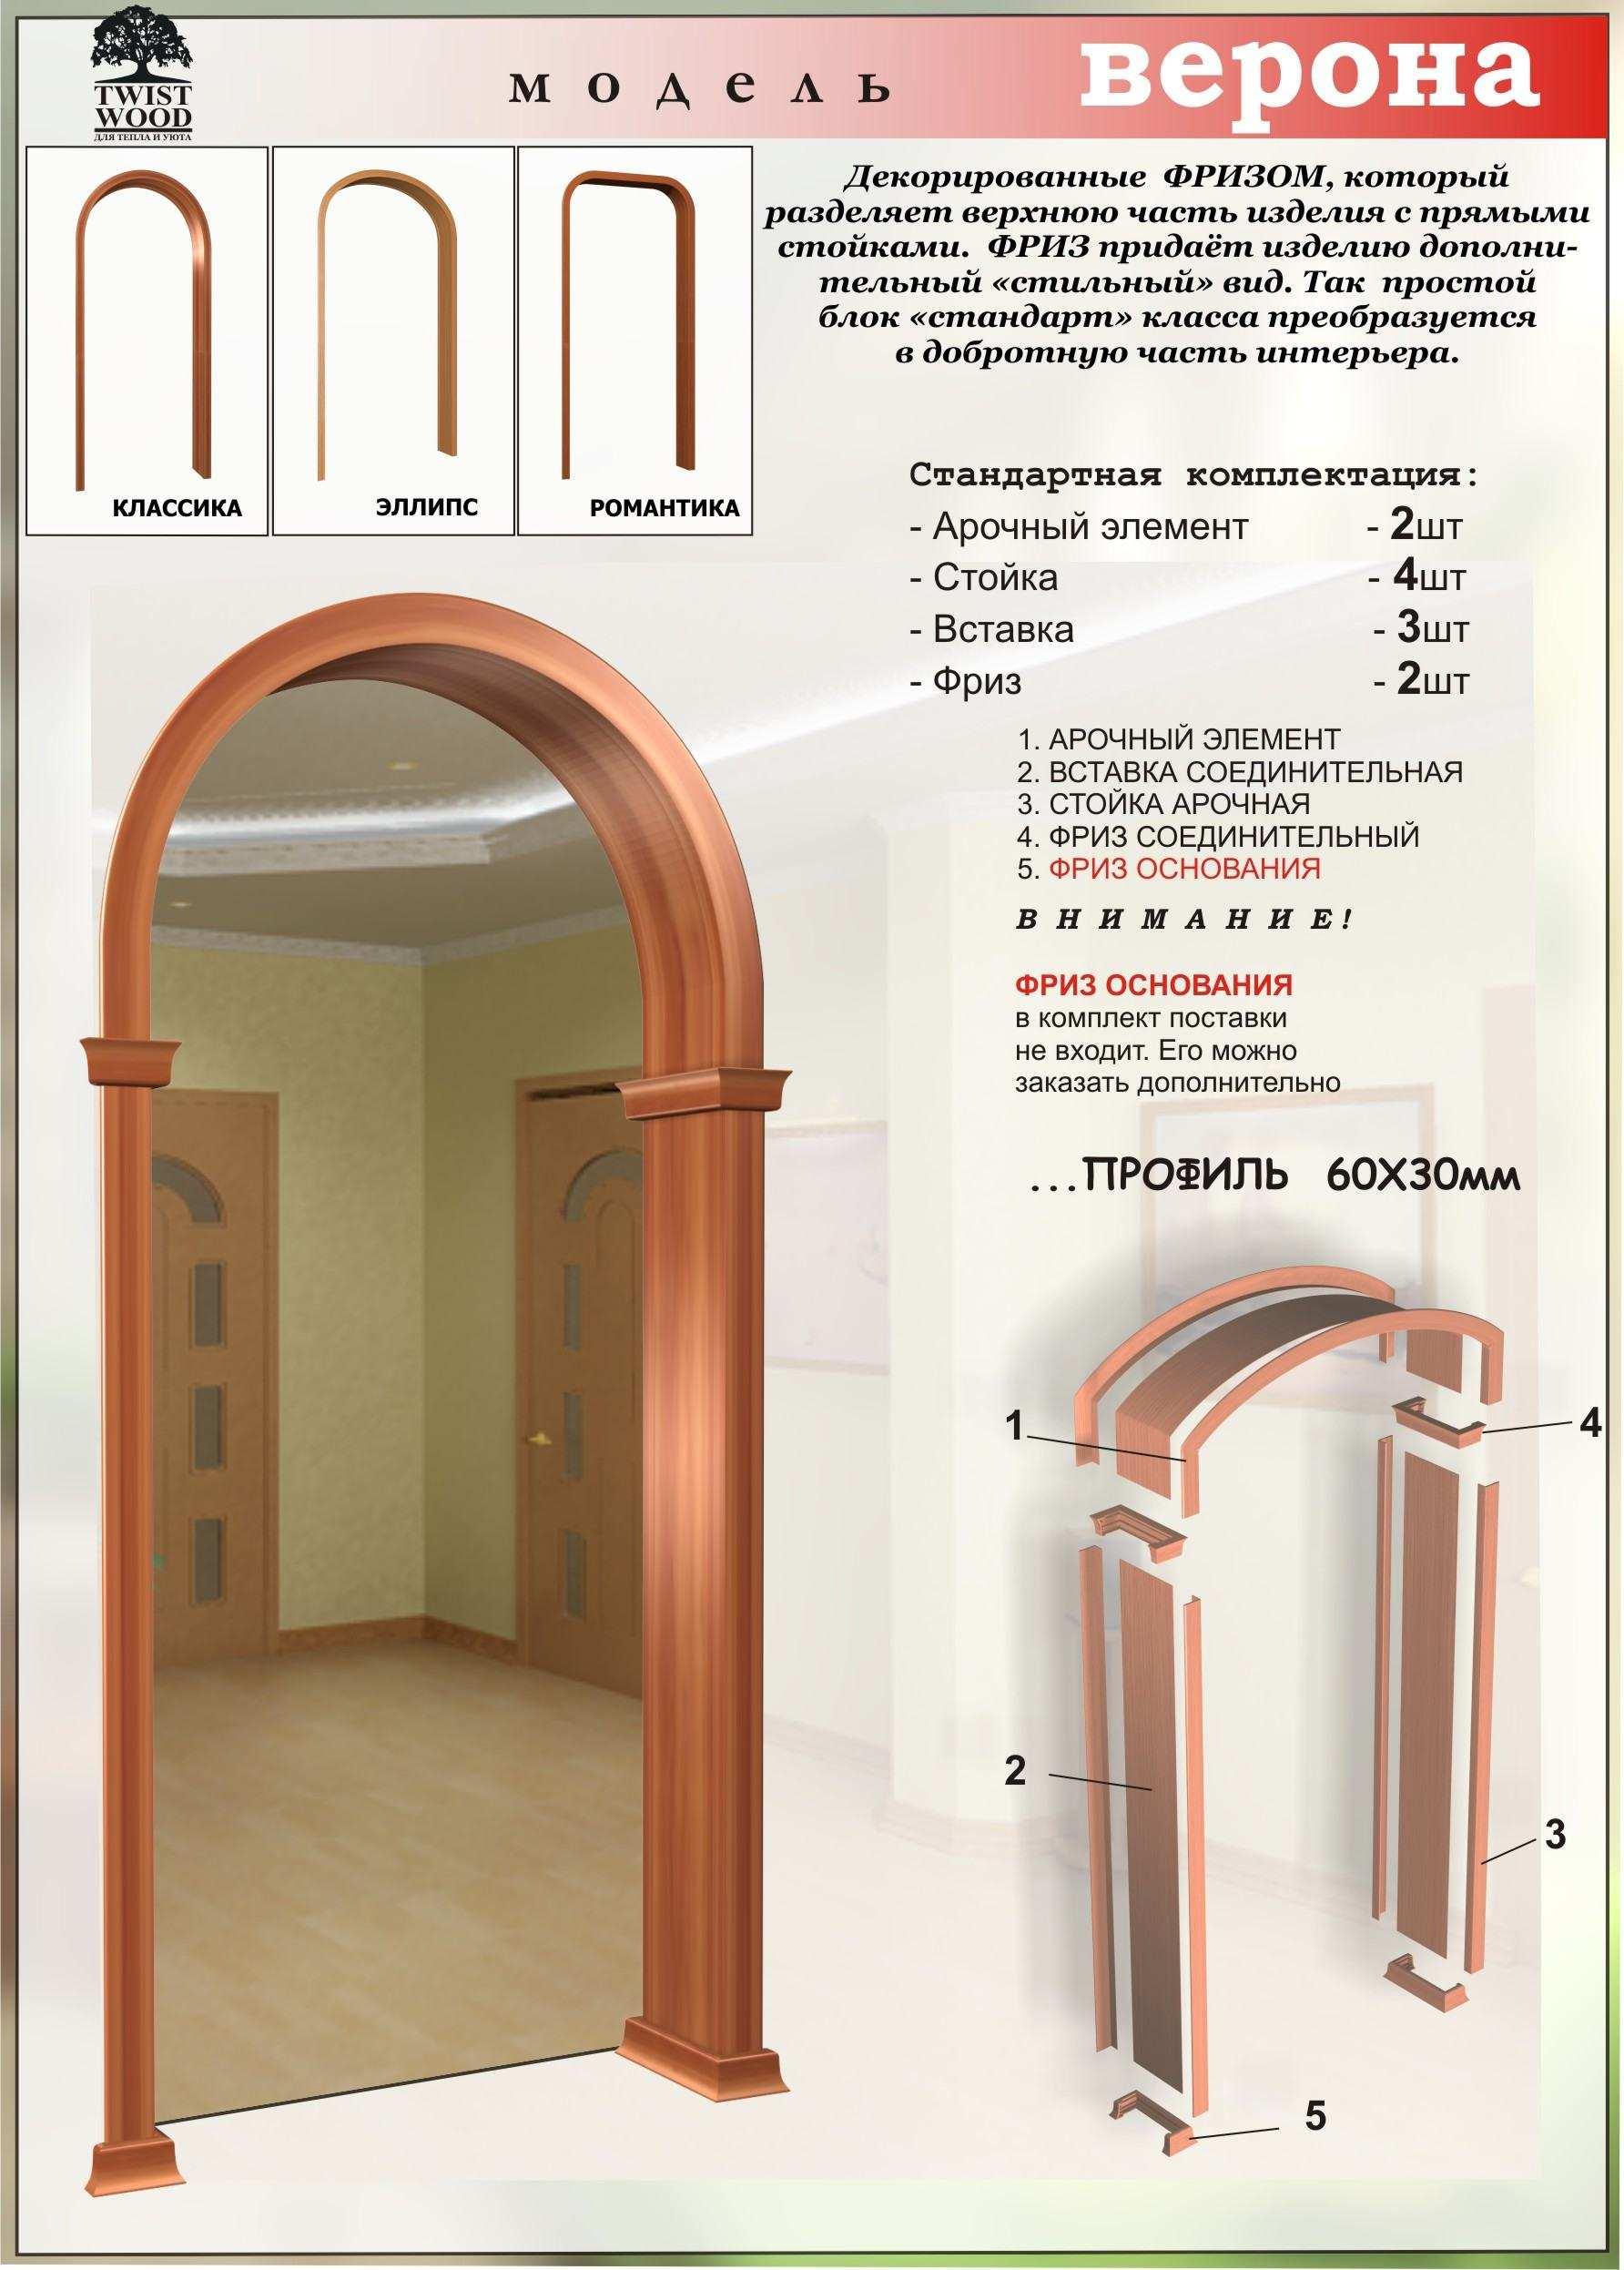 Размеры арки своими руками фото